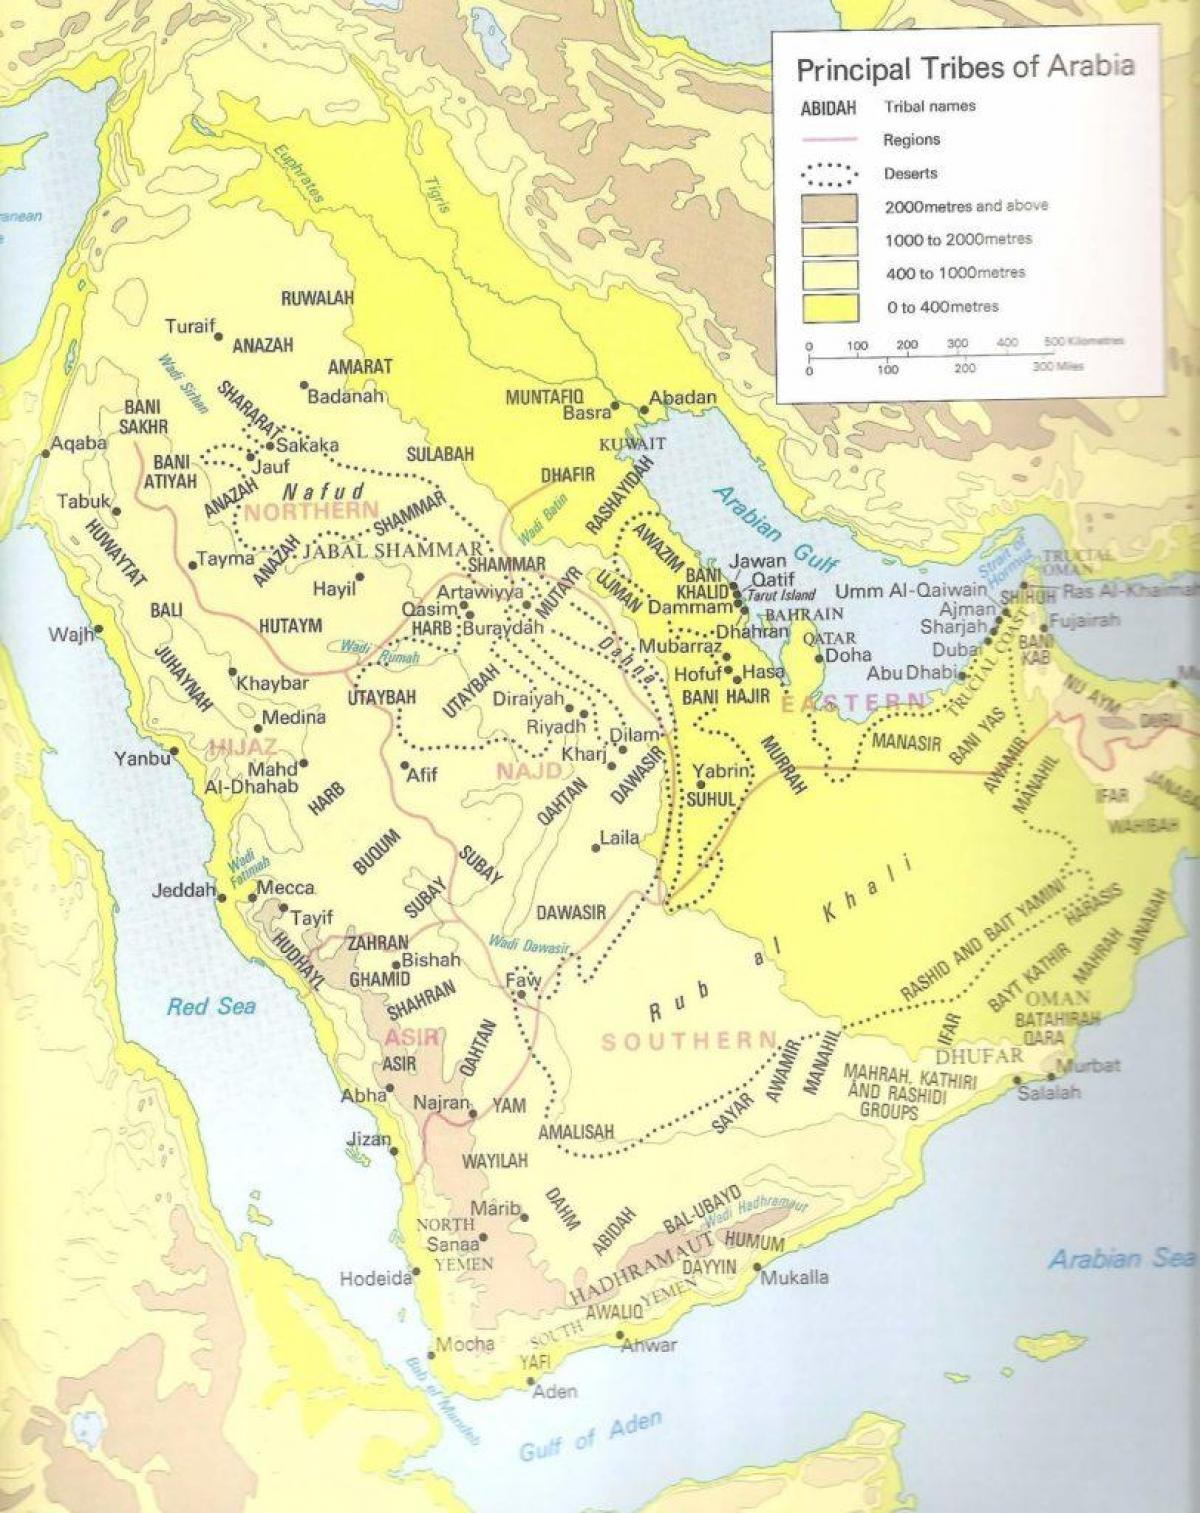 Saudi Arabien Stammer Kort Kort Over Saudi Arabien Stammer Det